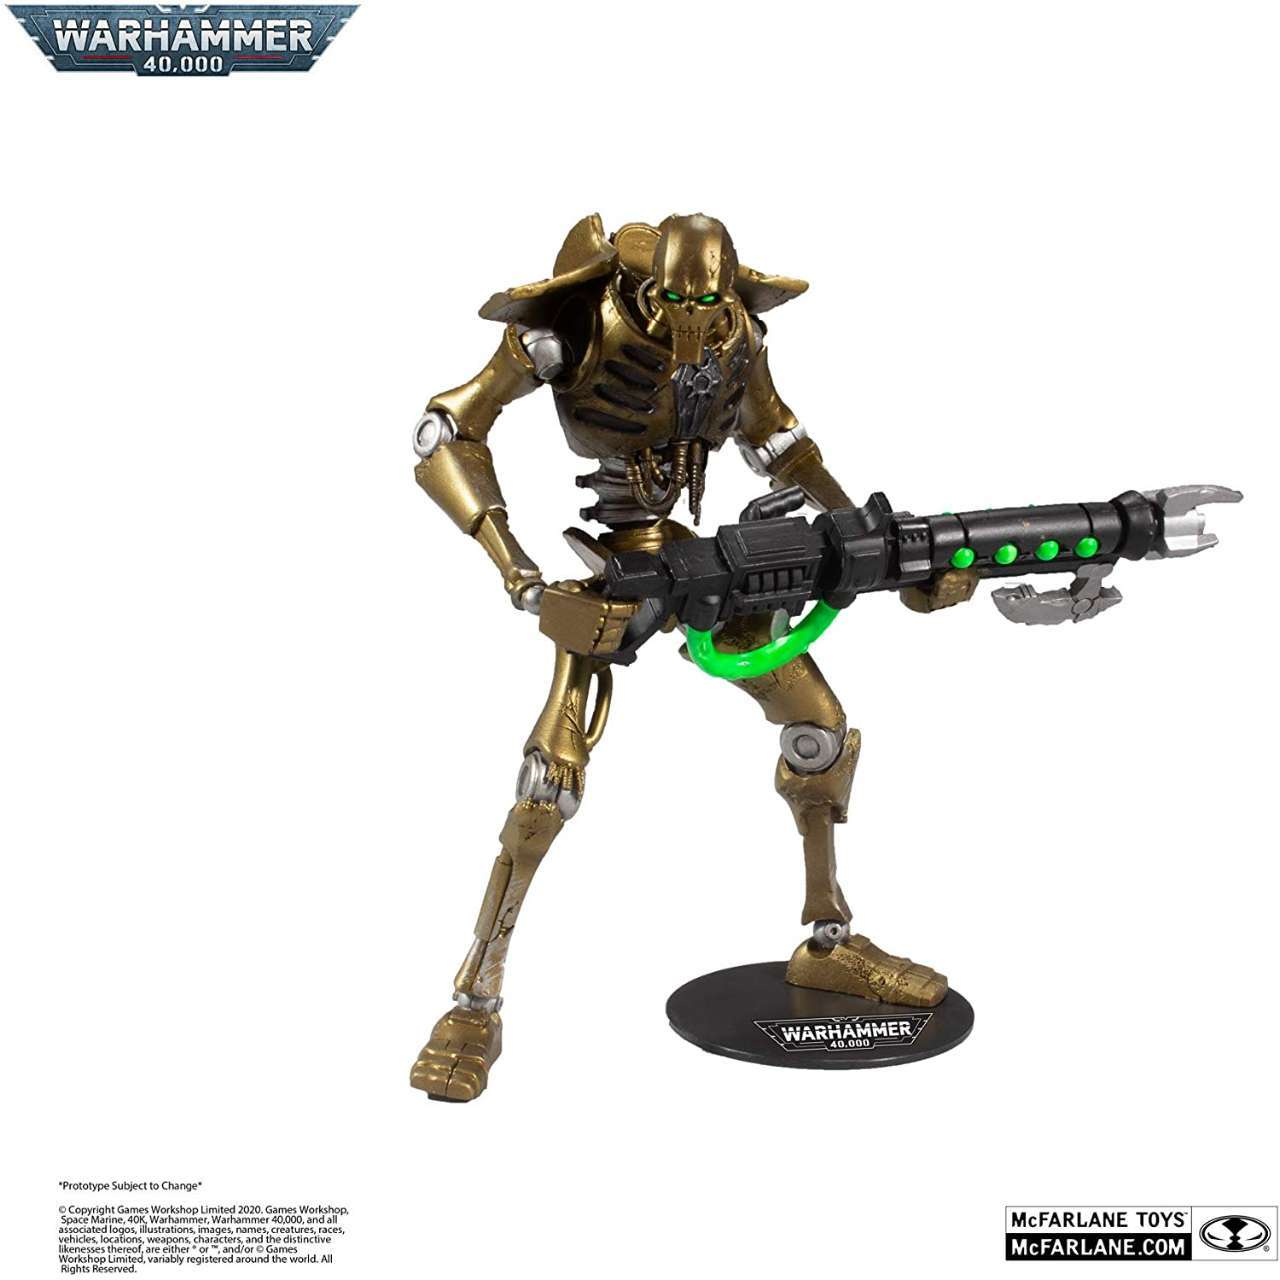 mcfarlane-warhammer-4000071zl8Jt52ZL_AC_SL1500_